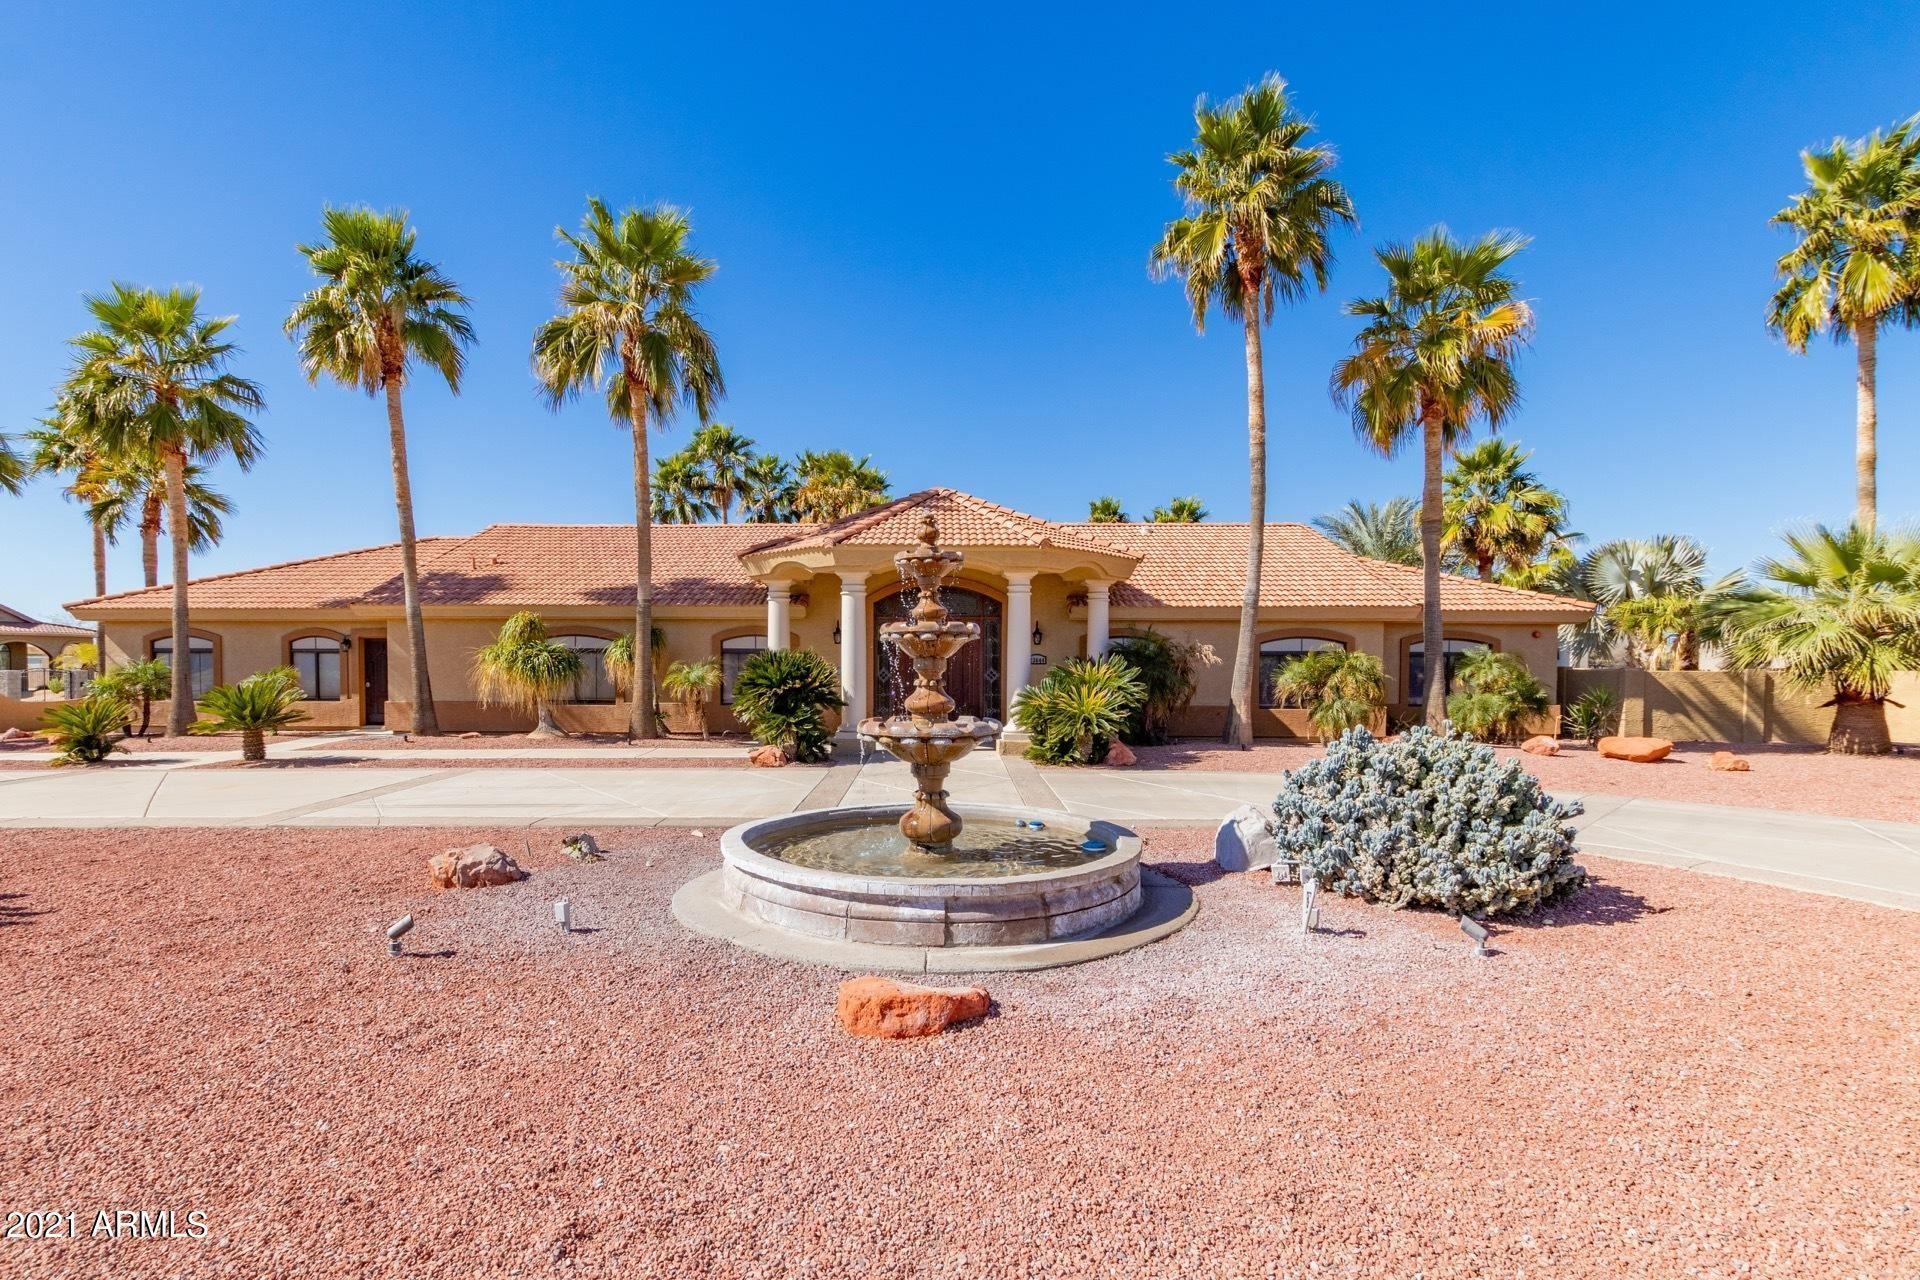 23644 N 67TH Avenue, Peoria, AZ 85383 - MLS#: 6194606